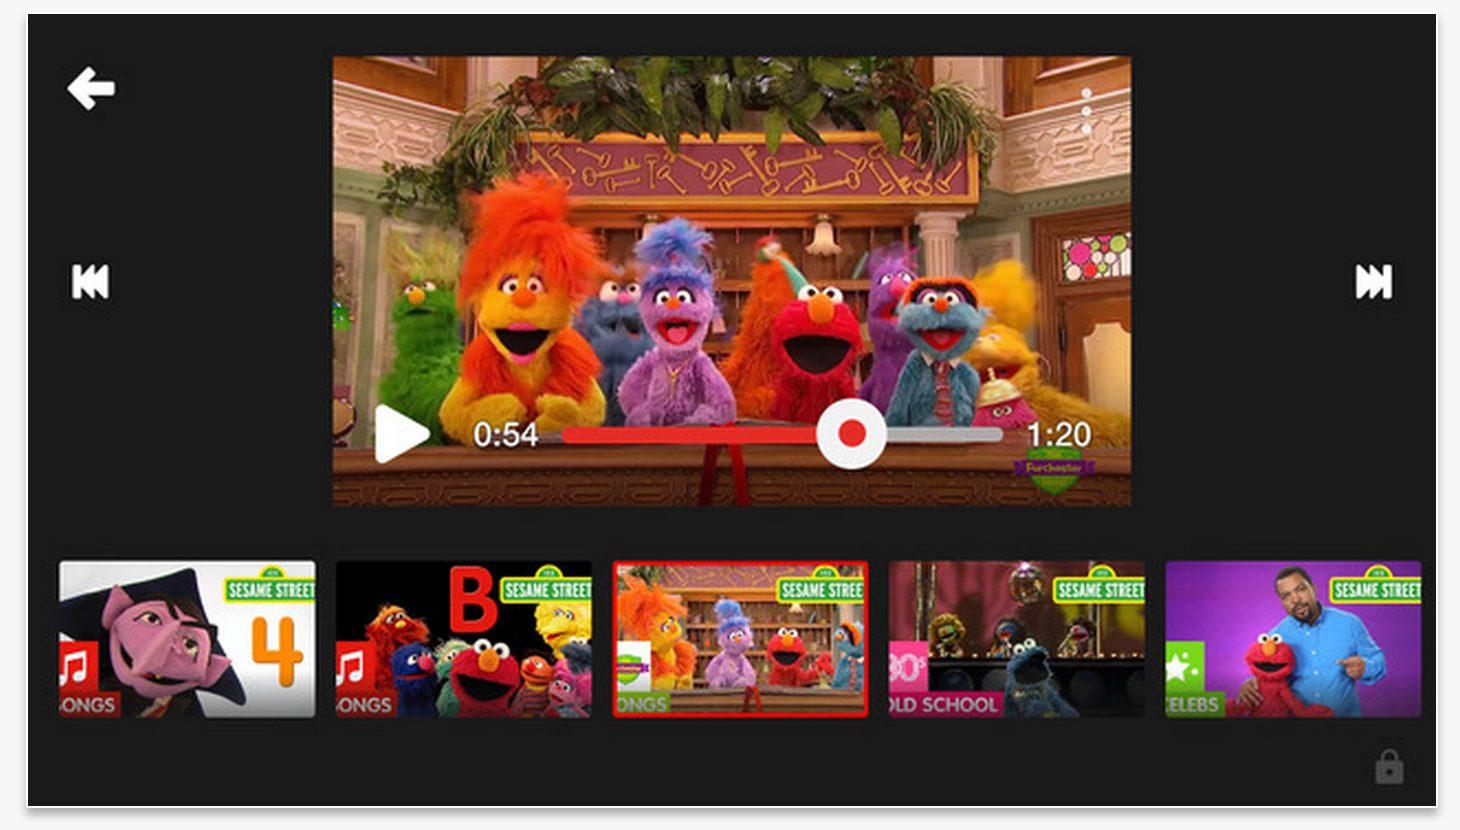 Screen Shot of Sesame Street playlist on YouTube Kids app